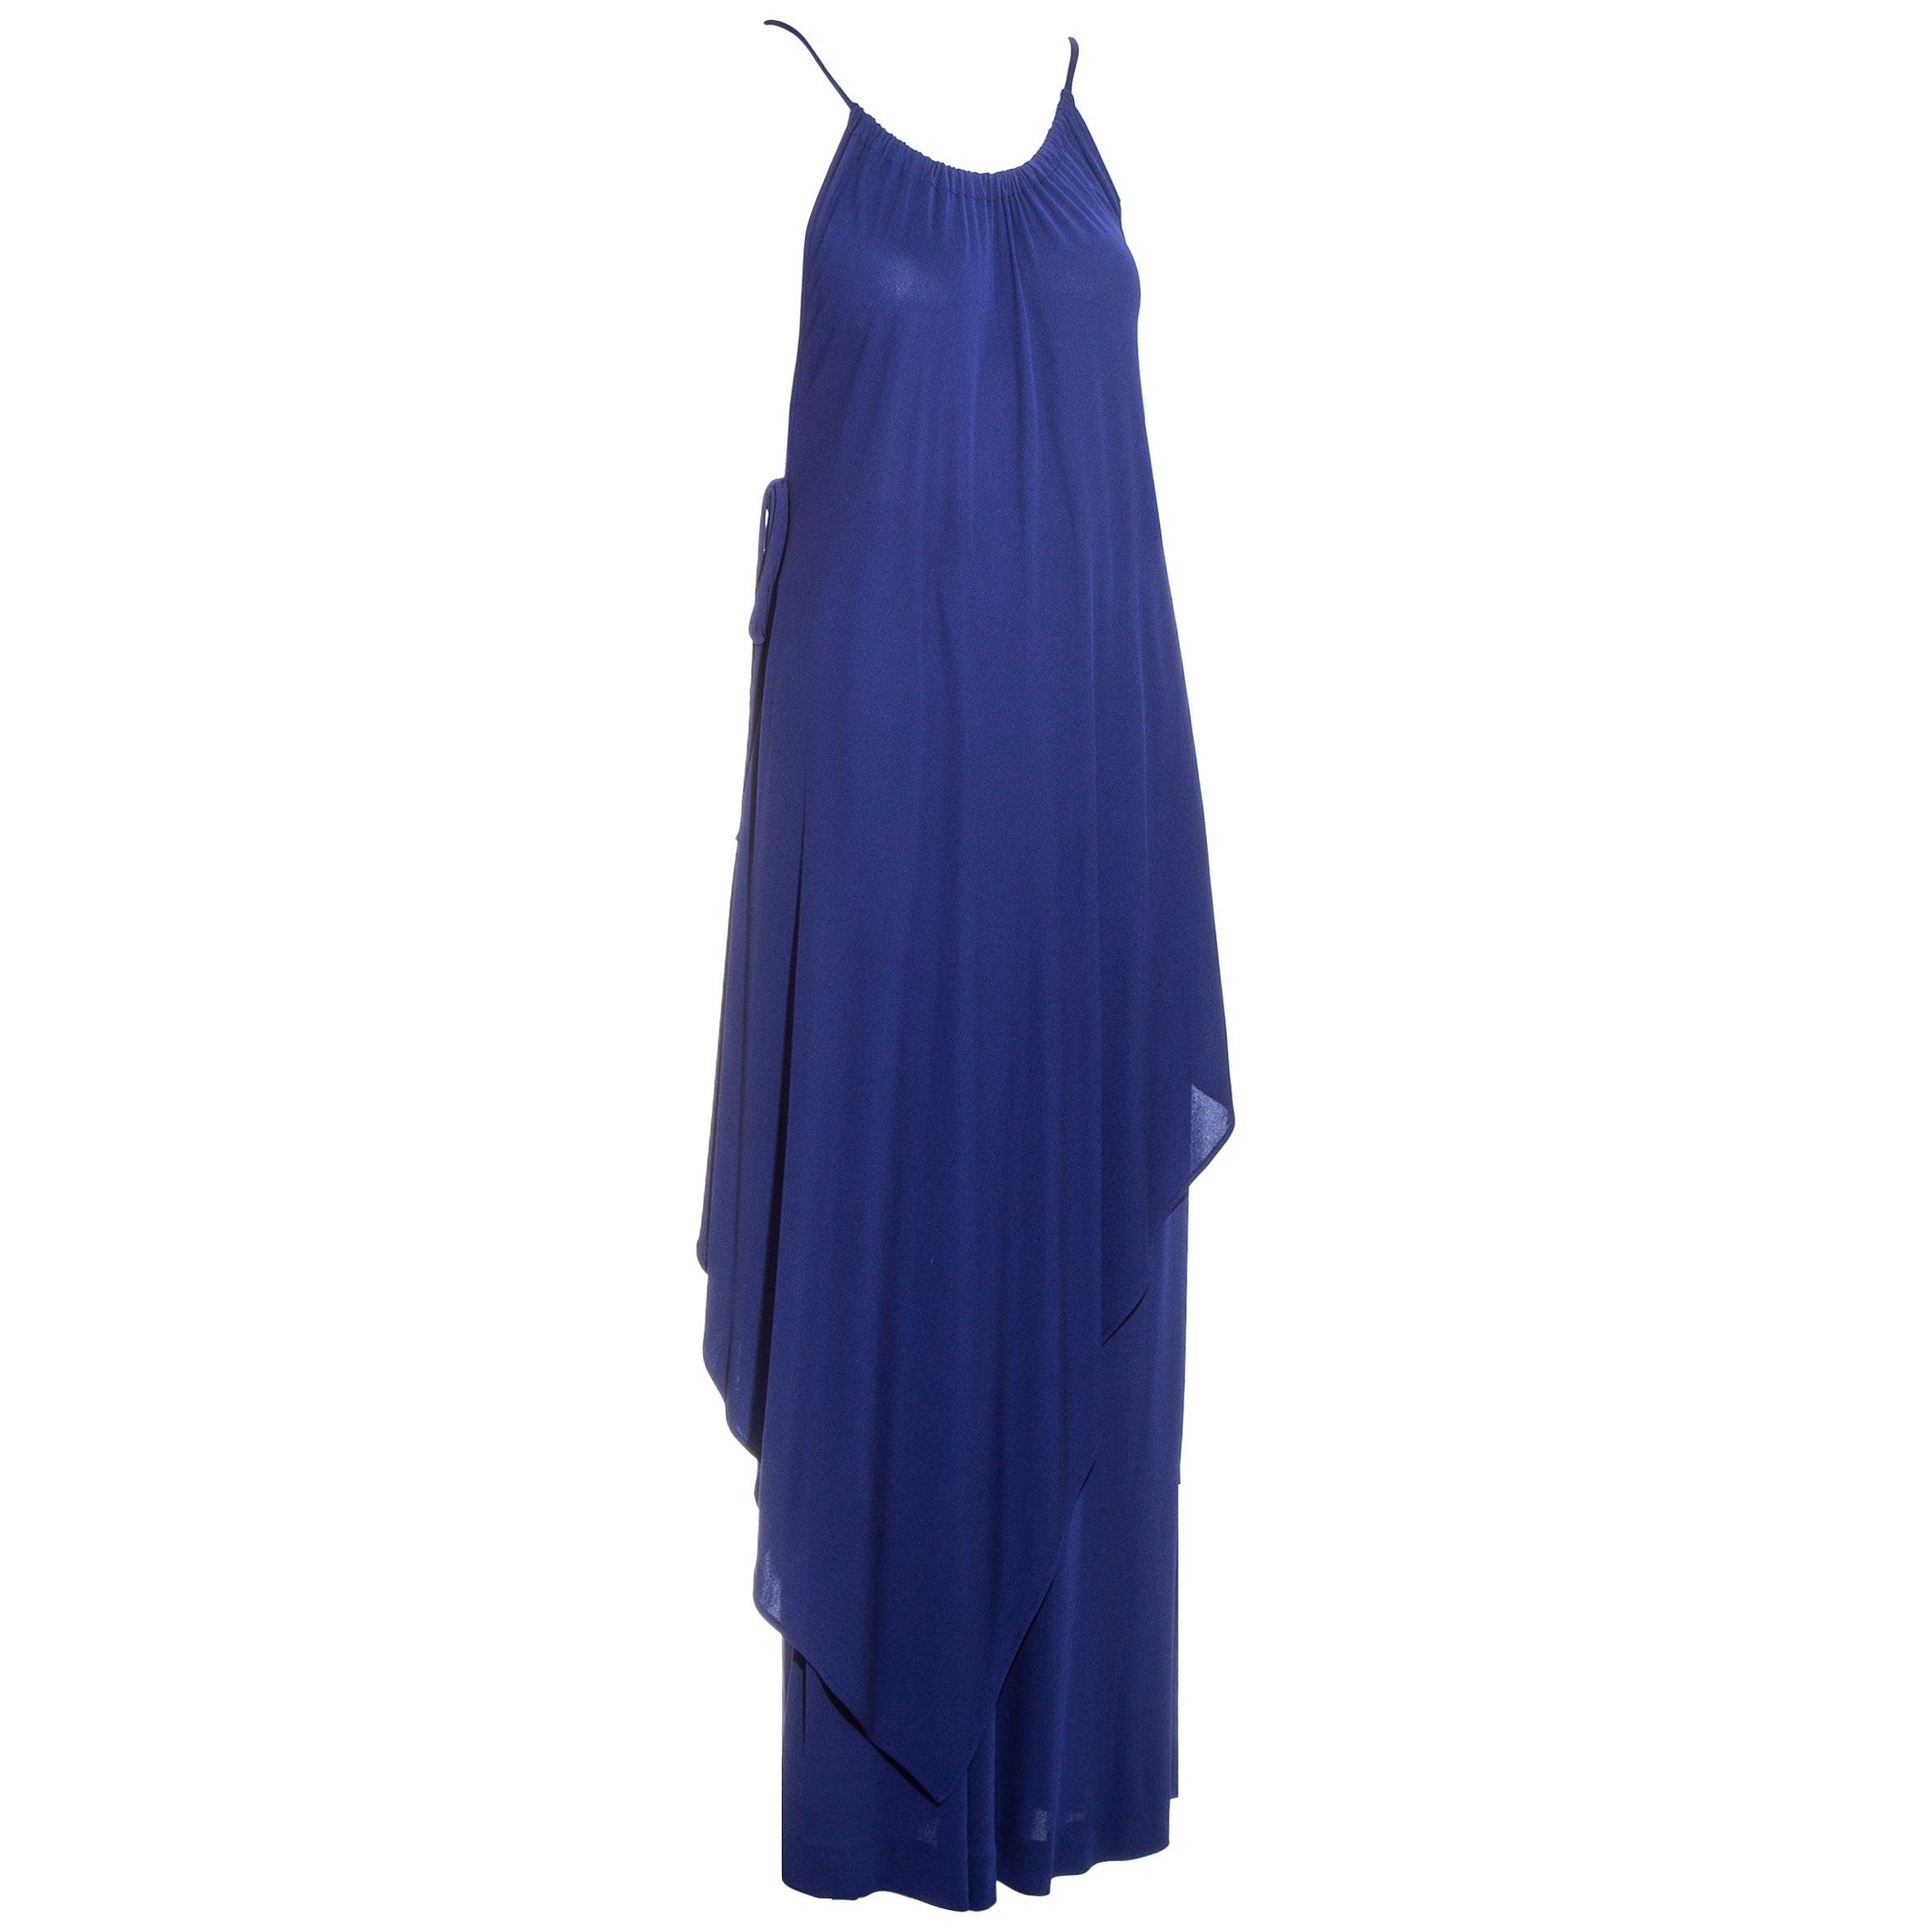 Yves Saint Laurent blue viscose jersey tunic and skirt ensemble, c. 1970s